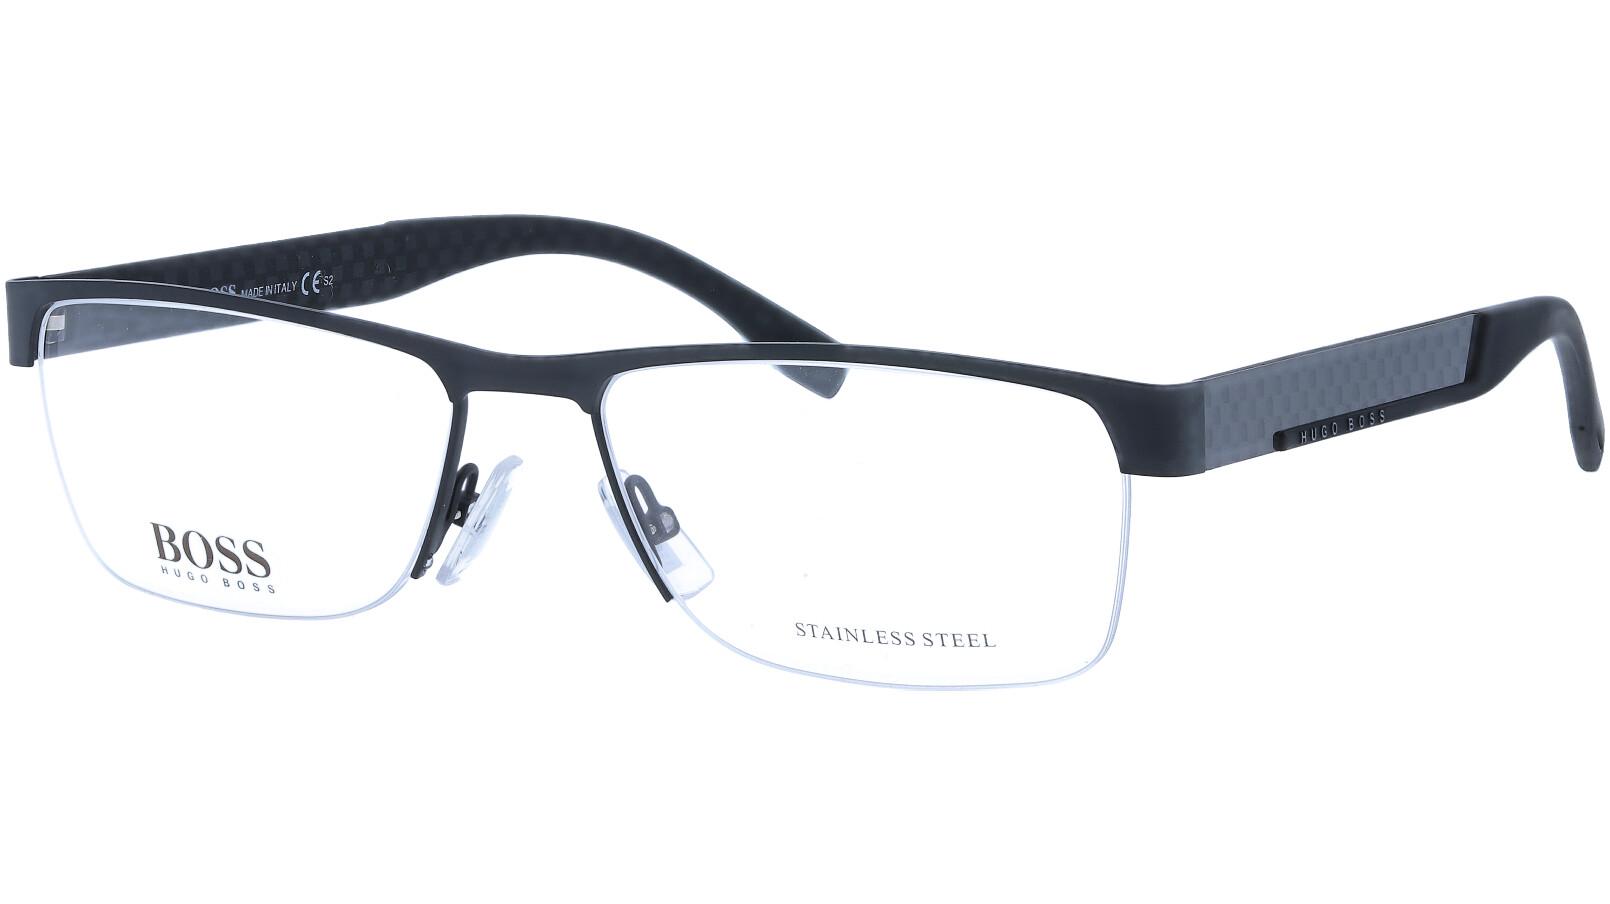 Hugo Boss BOSS0644 HXJ 56 MTTBK Glasses